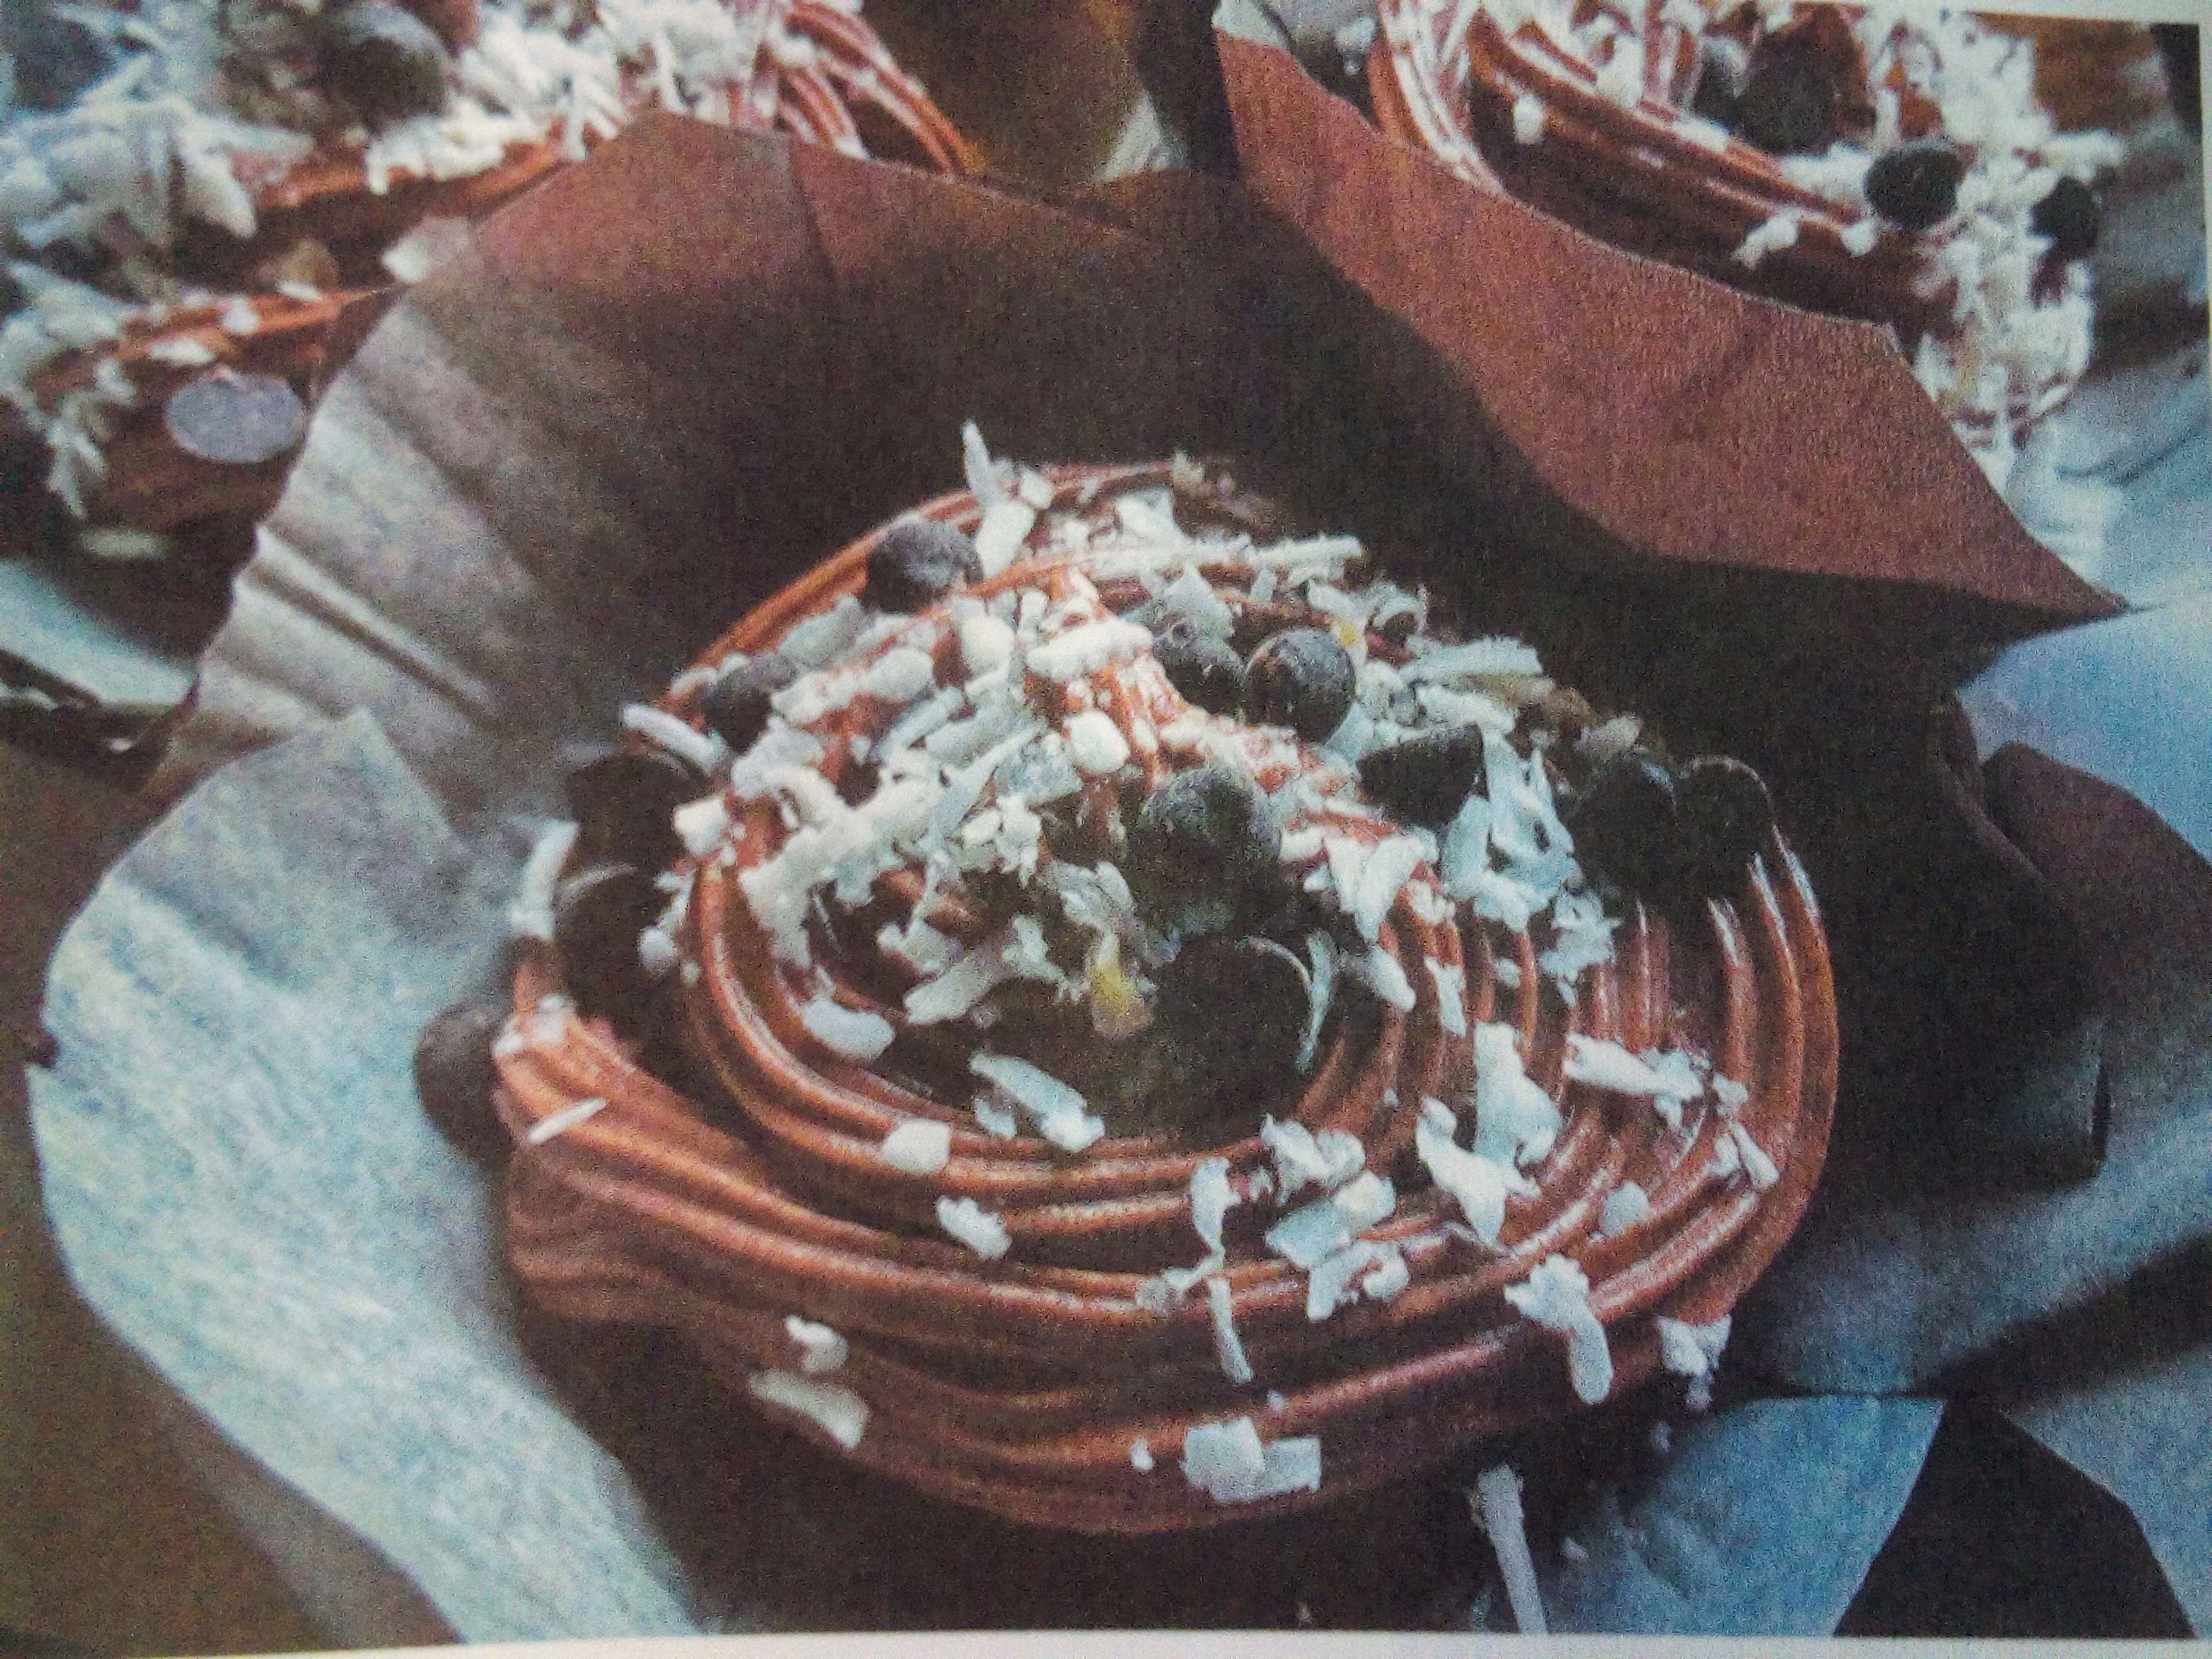 choco-cupcake